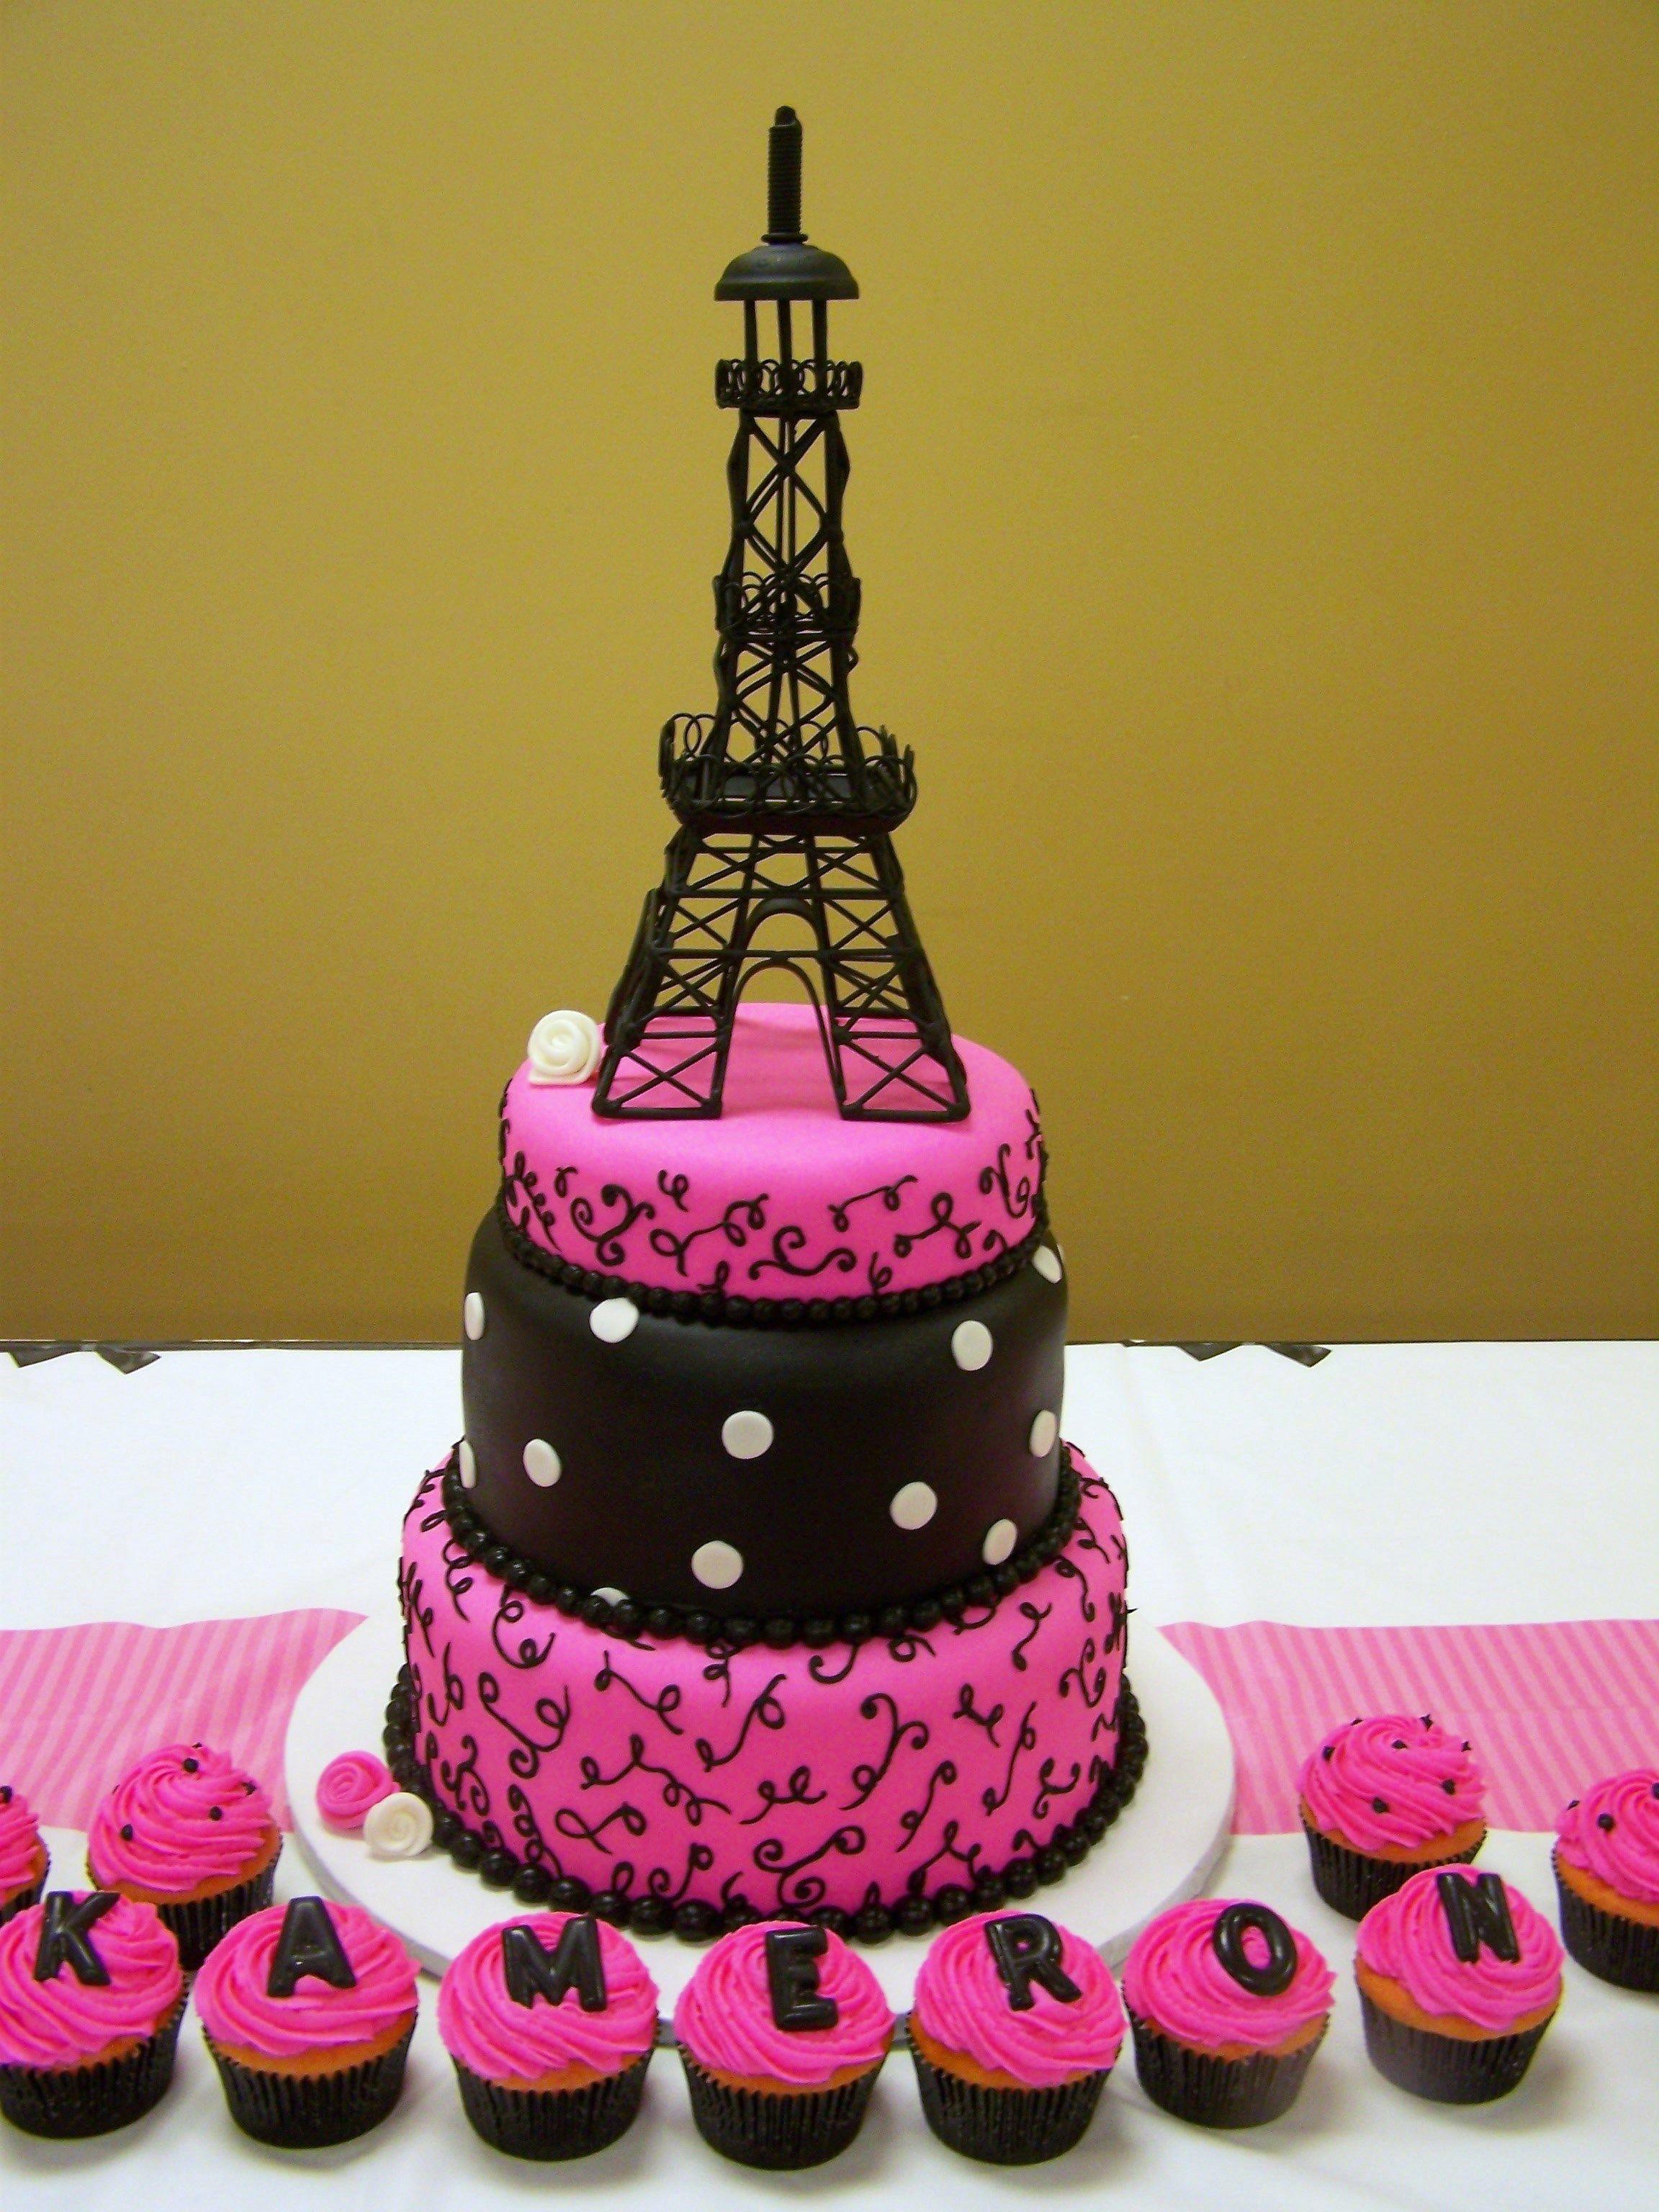 Paris Themed Cake Paris Themed Cakes Paris Cakes Birthday Cake